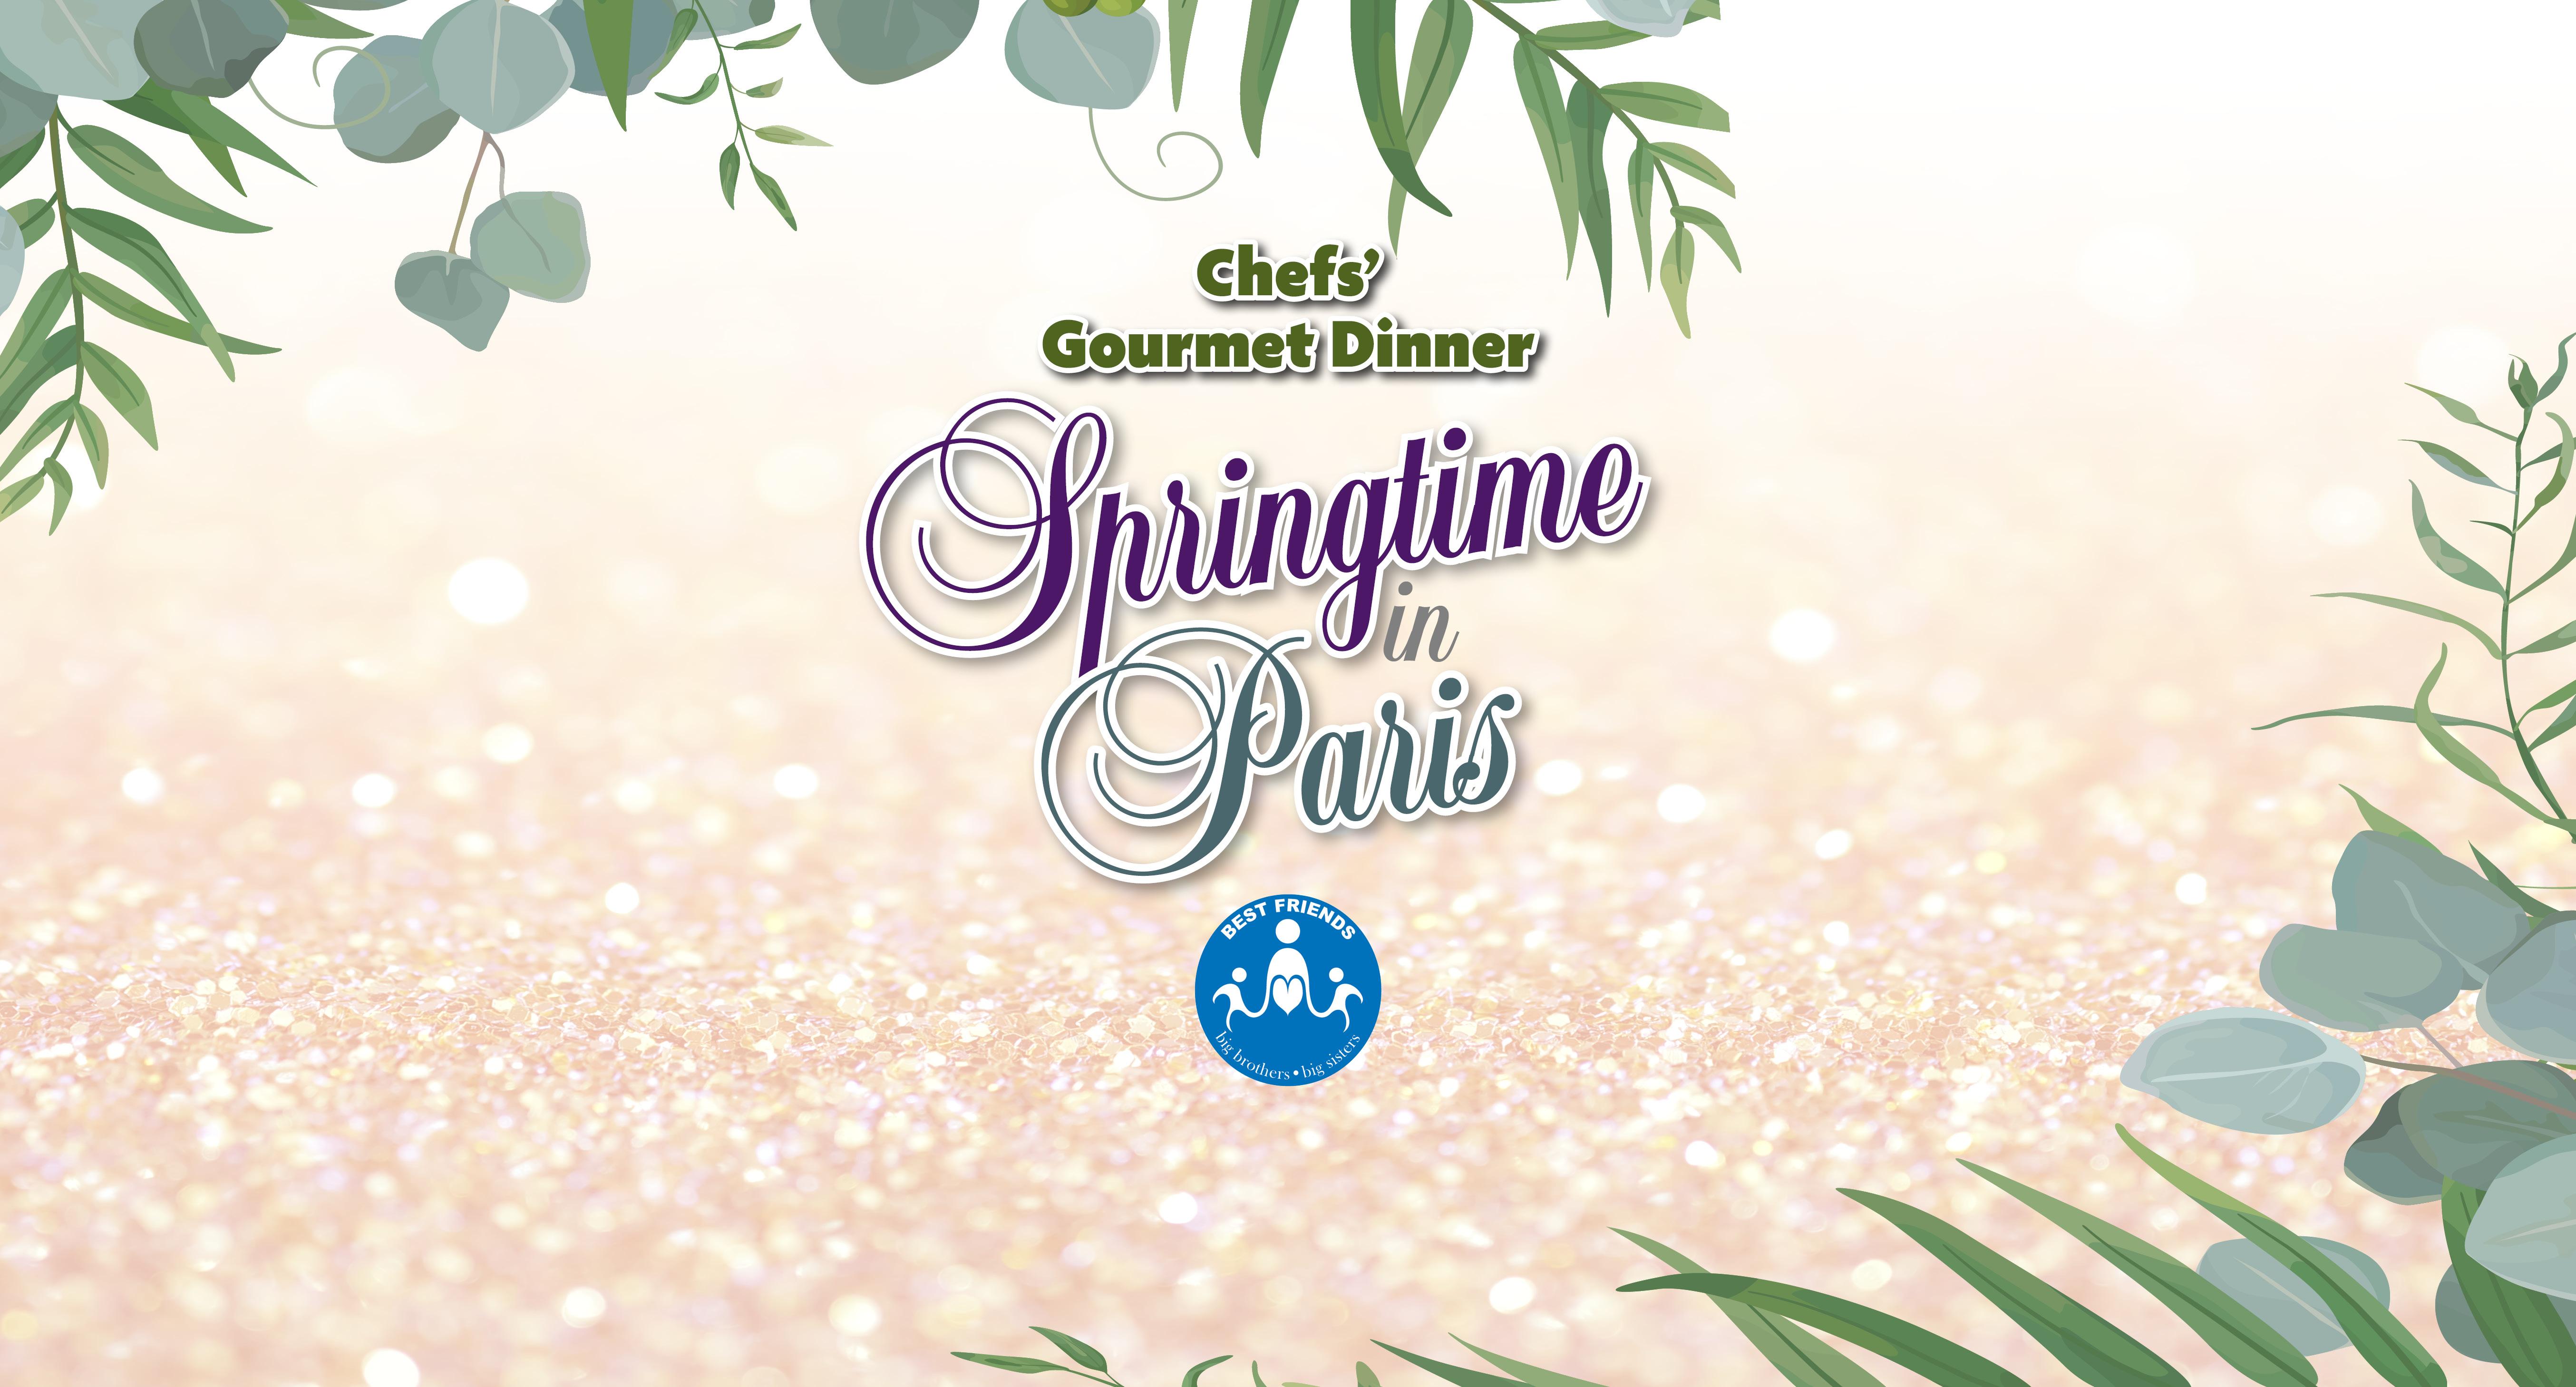 Chefs Gourmet Dinner Springtime in Paris Slider